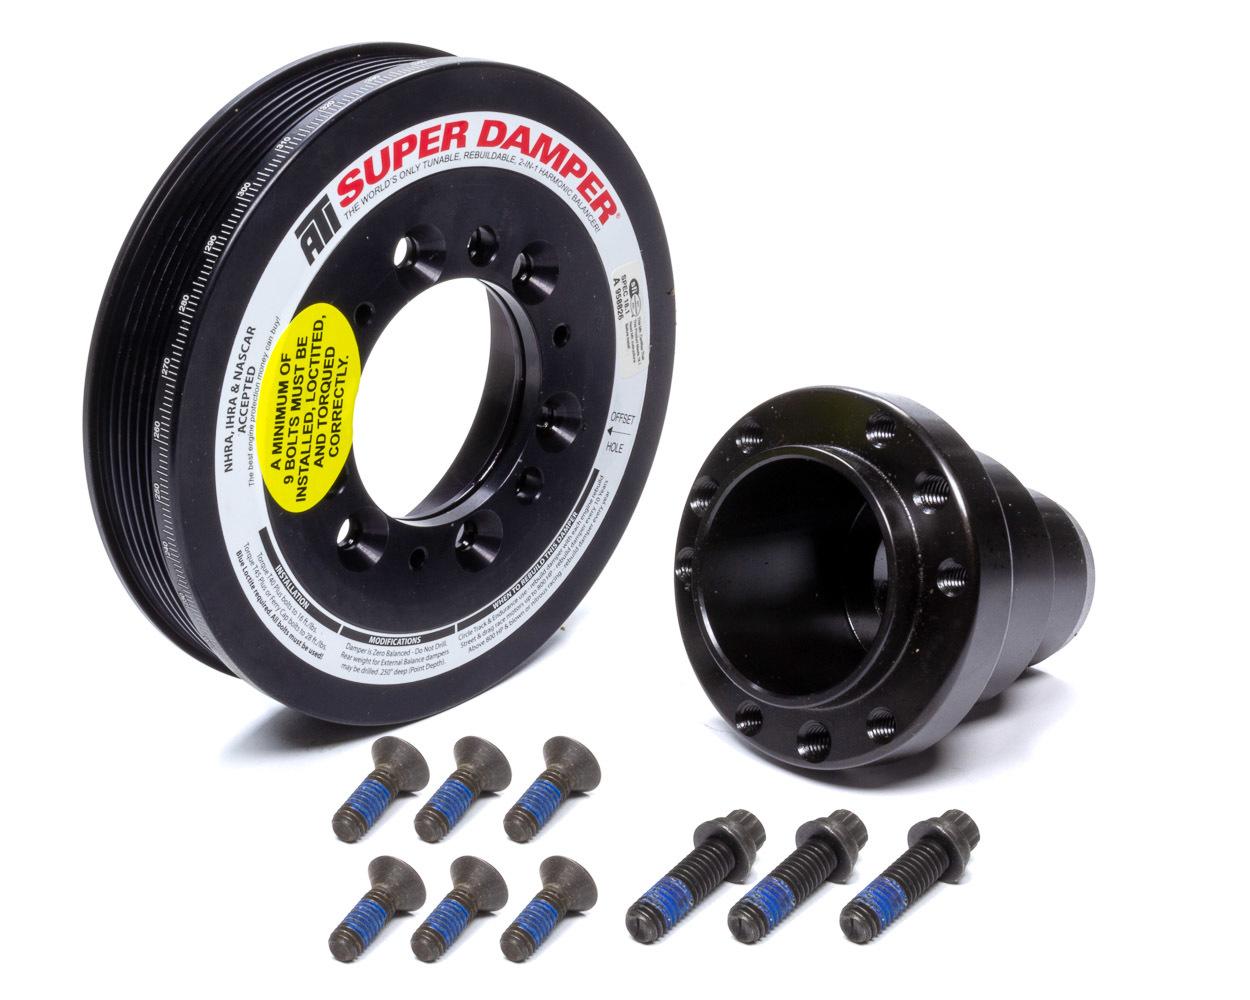 ATI Performance 918459 Harmonic Balancer Shell, Super Damper Standard, 6.780 in OD, SFI 18.1, Aluminum, Black, Internal Balance, Mopar Gen III Hemi, Each